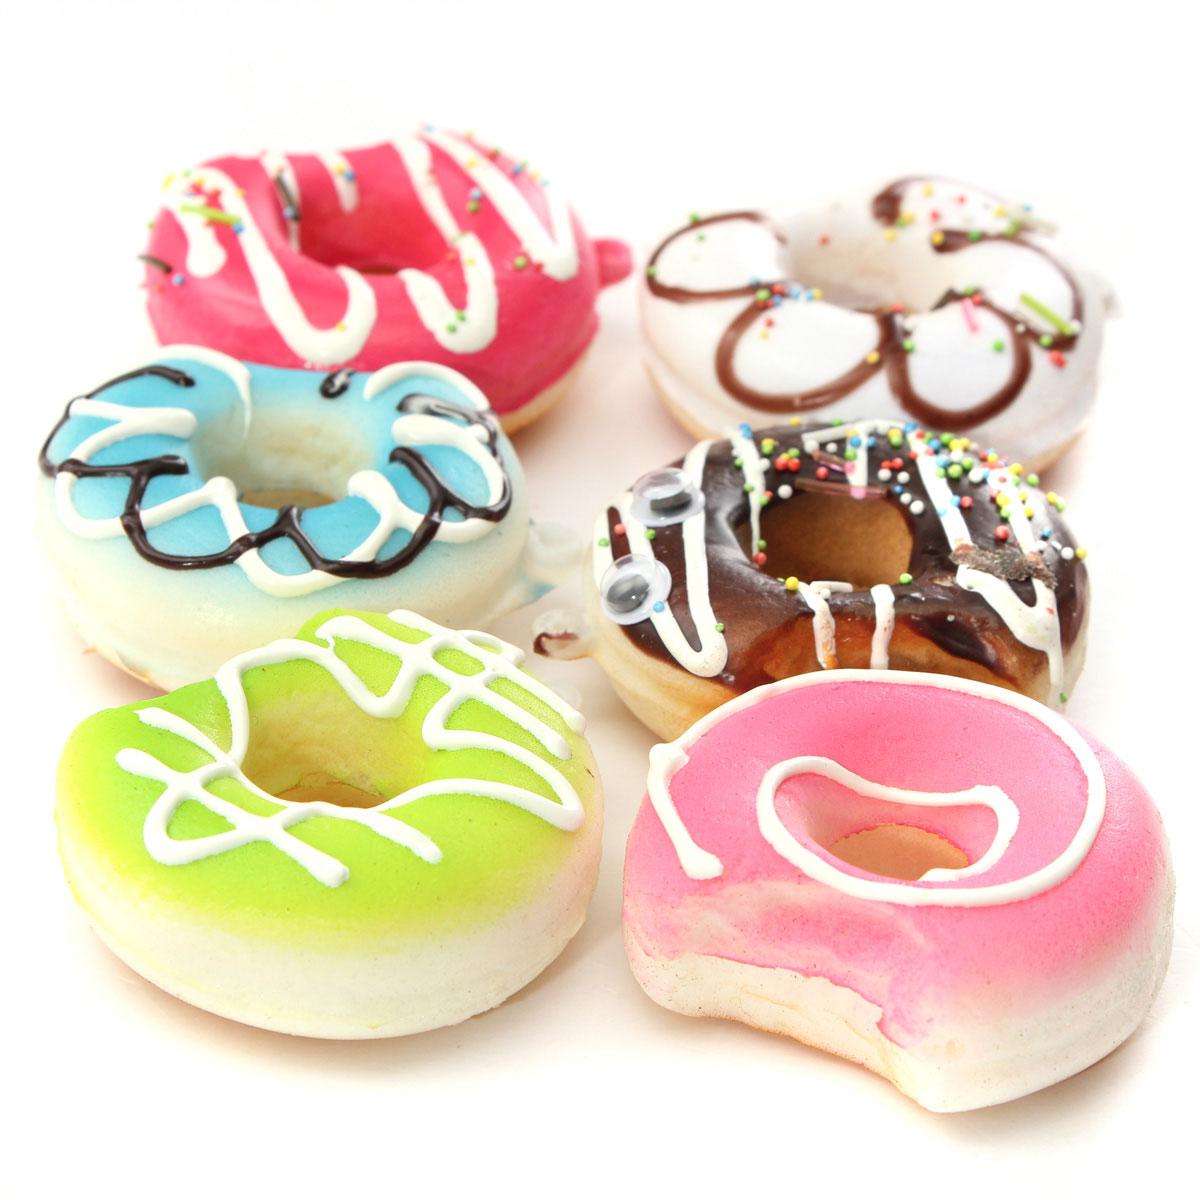 5CM Kawaii Bite me Donut Soft Cute Squishy Bread Keychain Bag Phone Charm Strap eBay